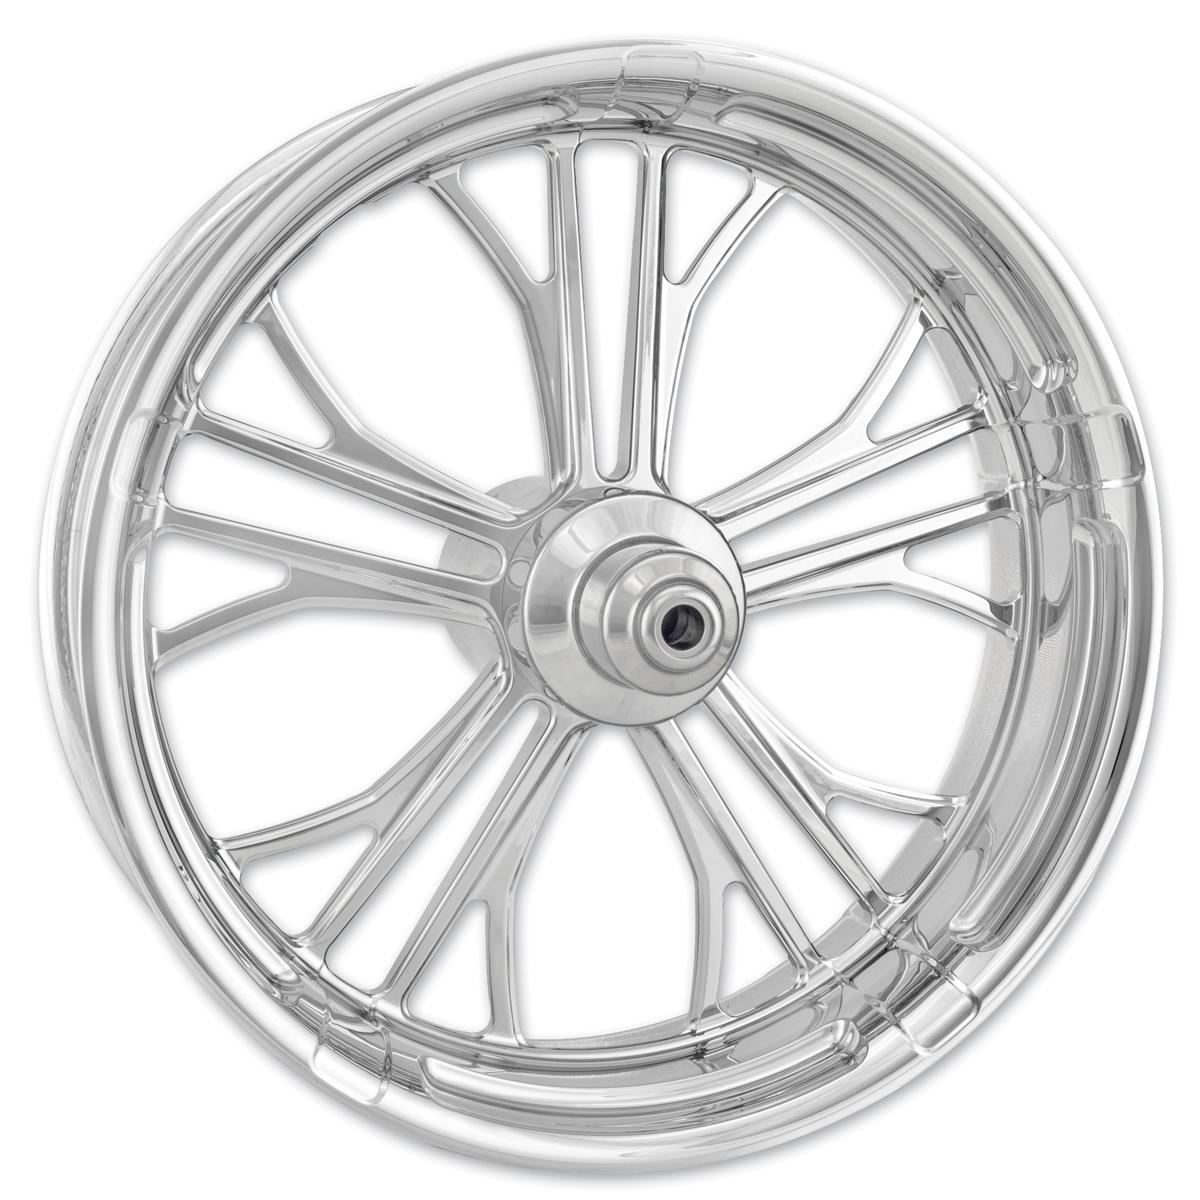 Performance Machine Dixon Chrome Rear Wheel 18x5.5 Non-ABS